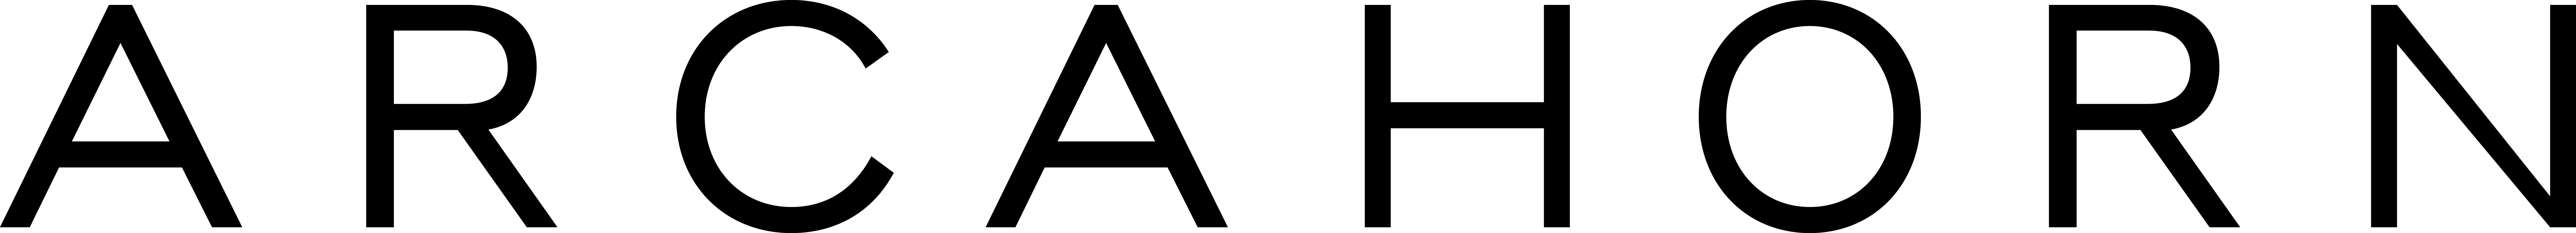 arcahorn logo1